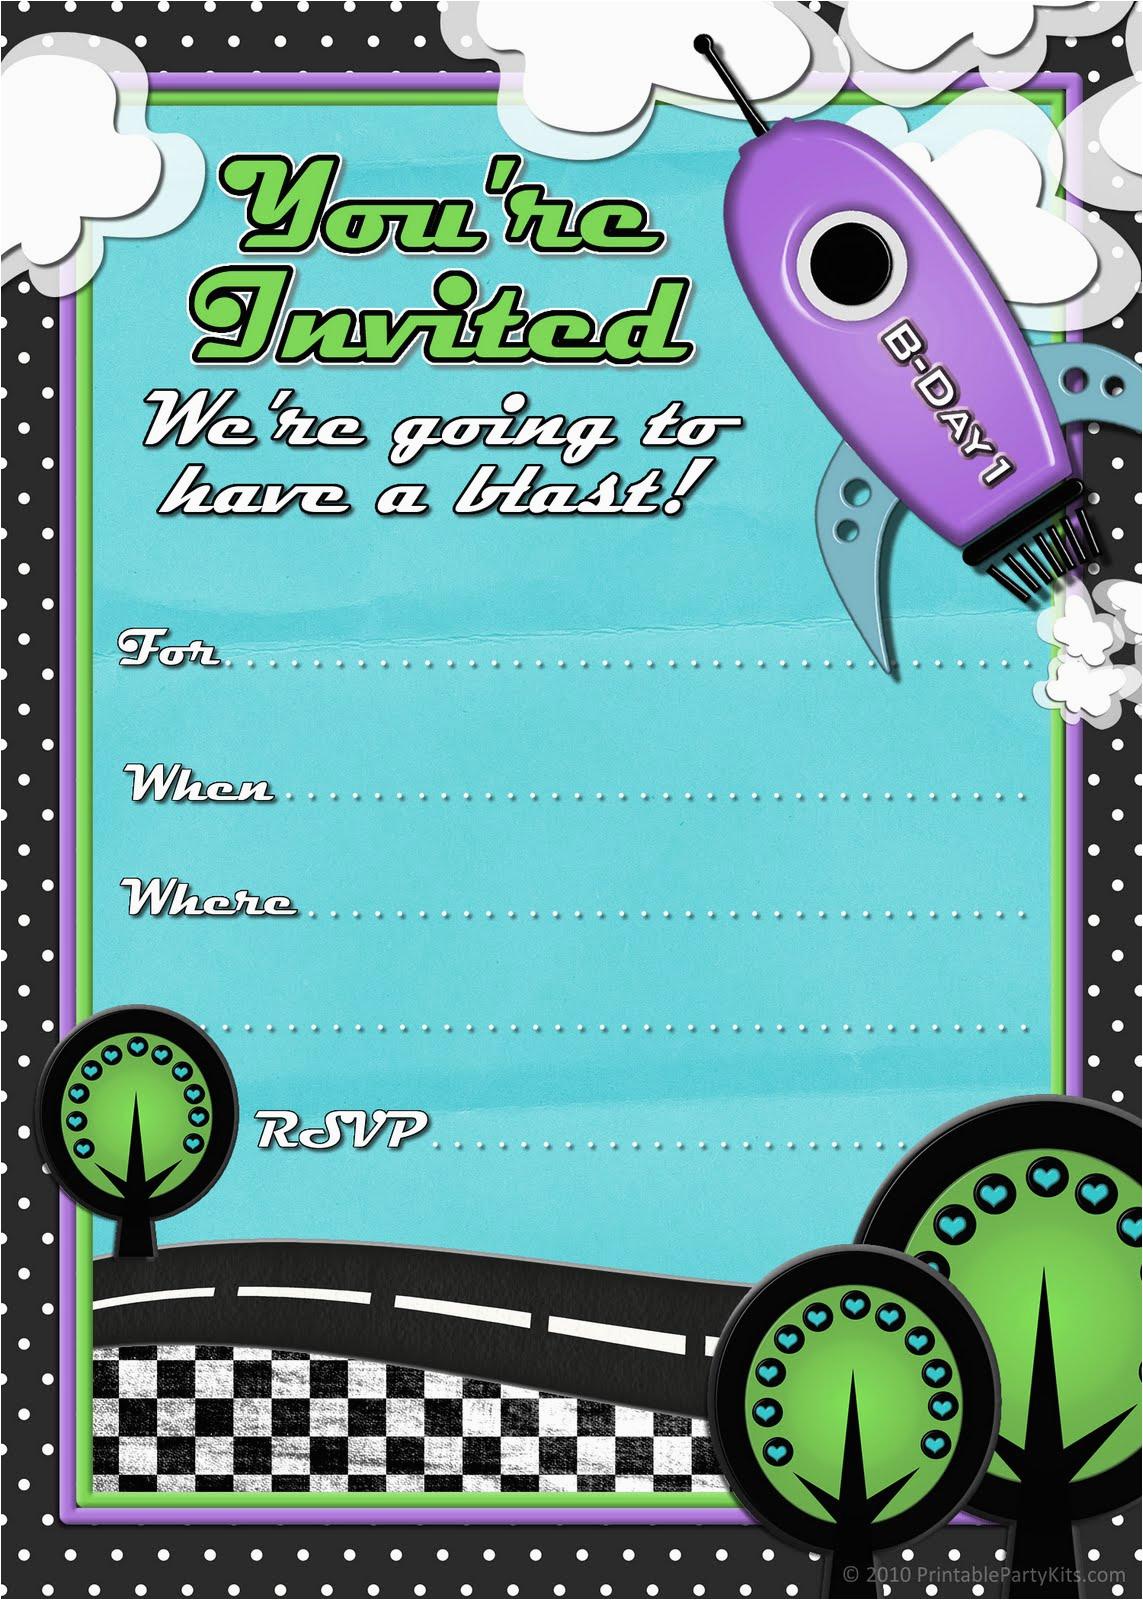 Free Printable Birthday Party Invitations For Boys | Birthdaybuzz - Free Printable Kids Birthday Cards Boys